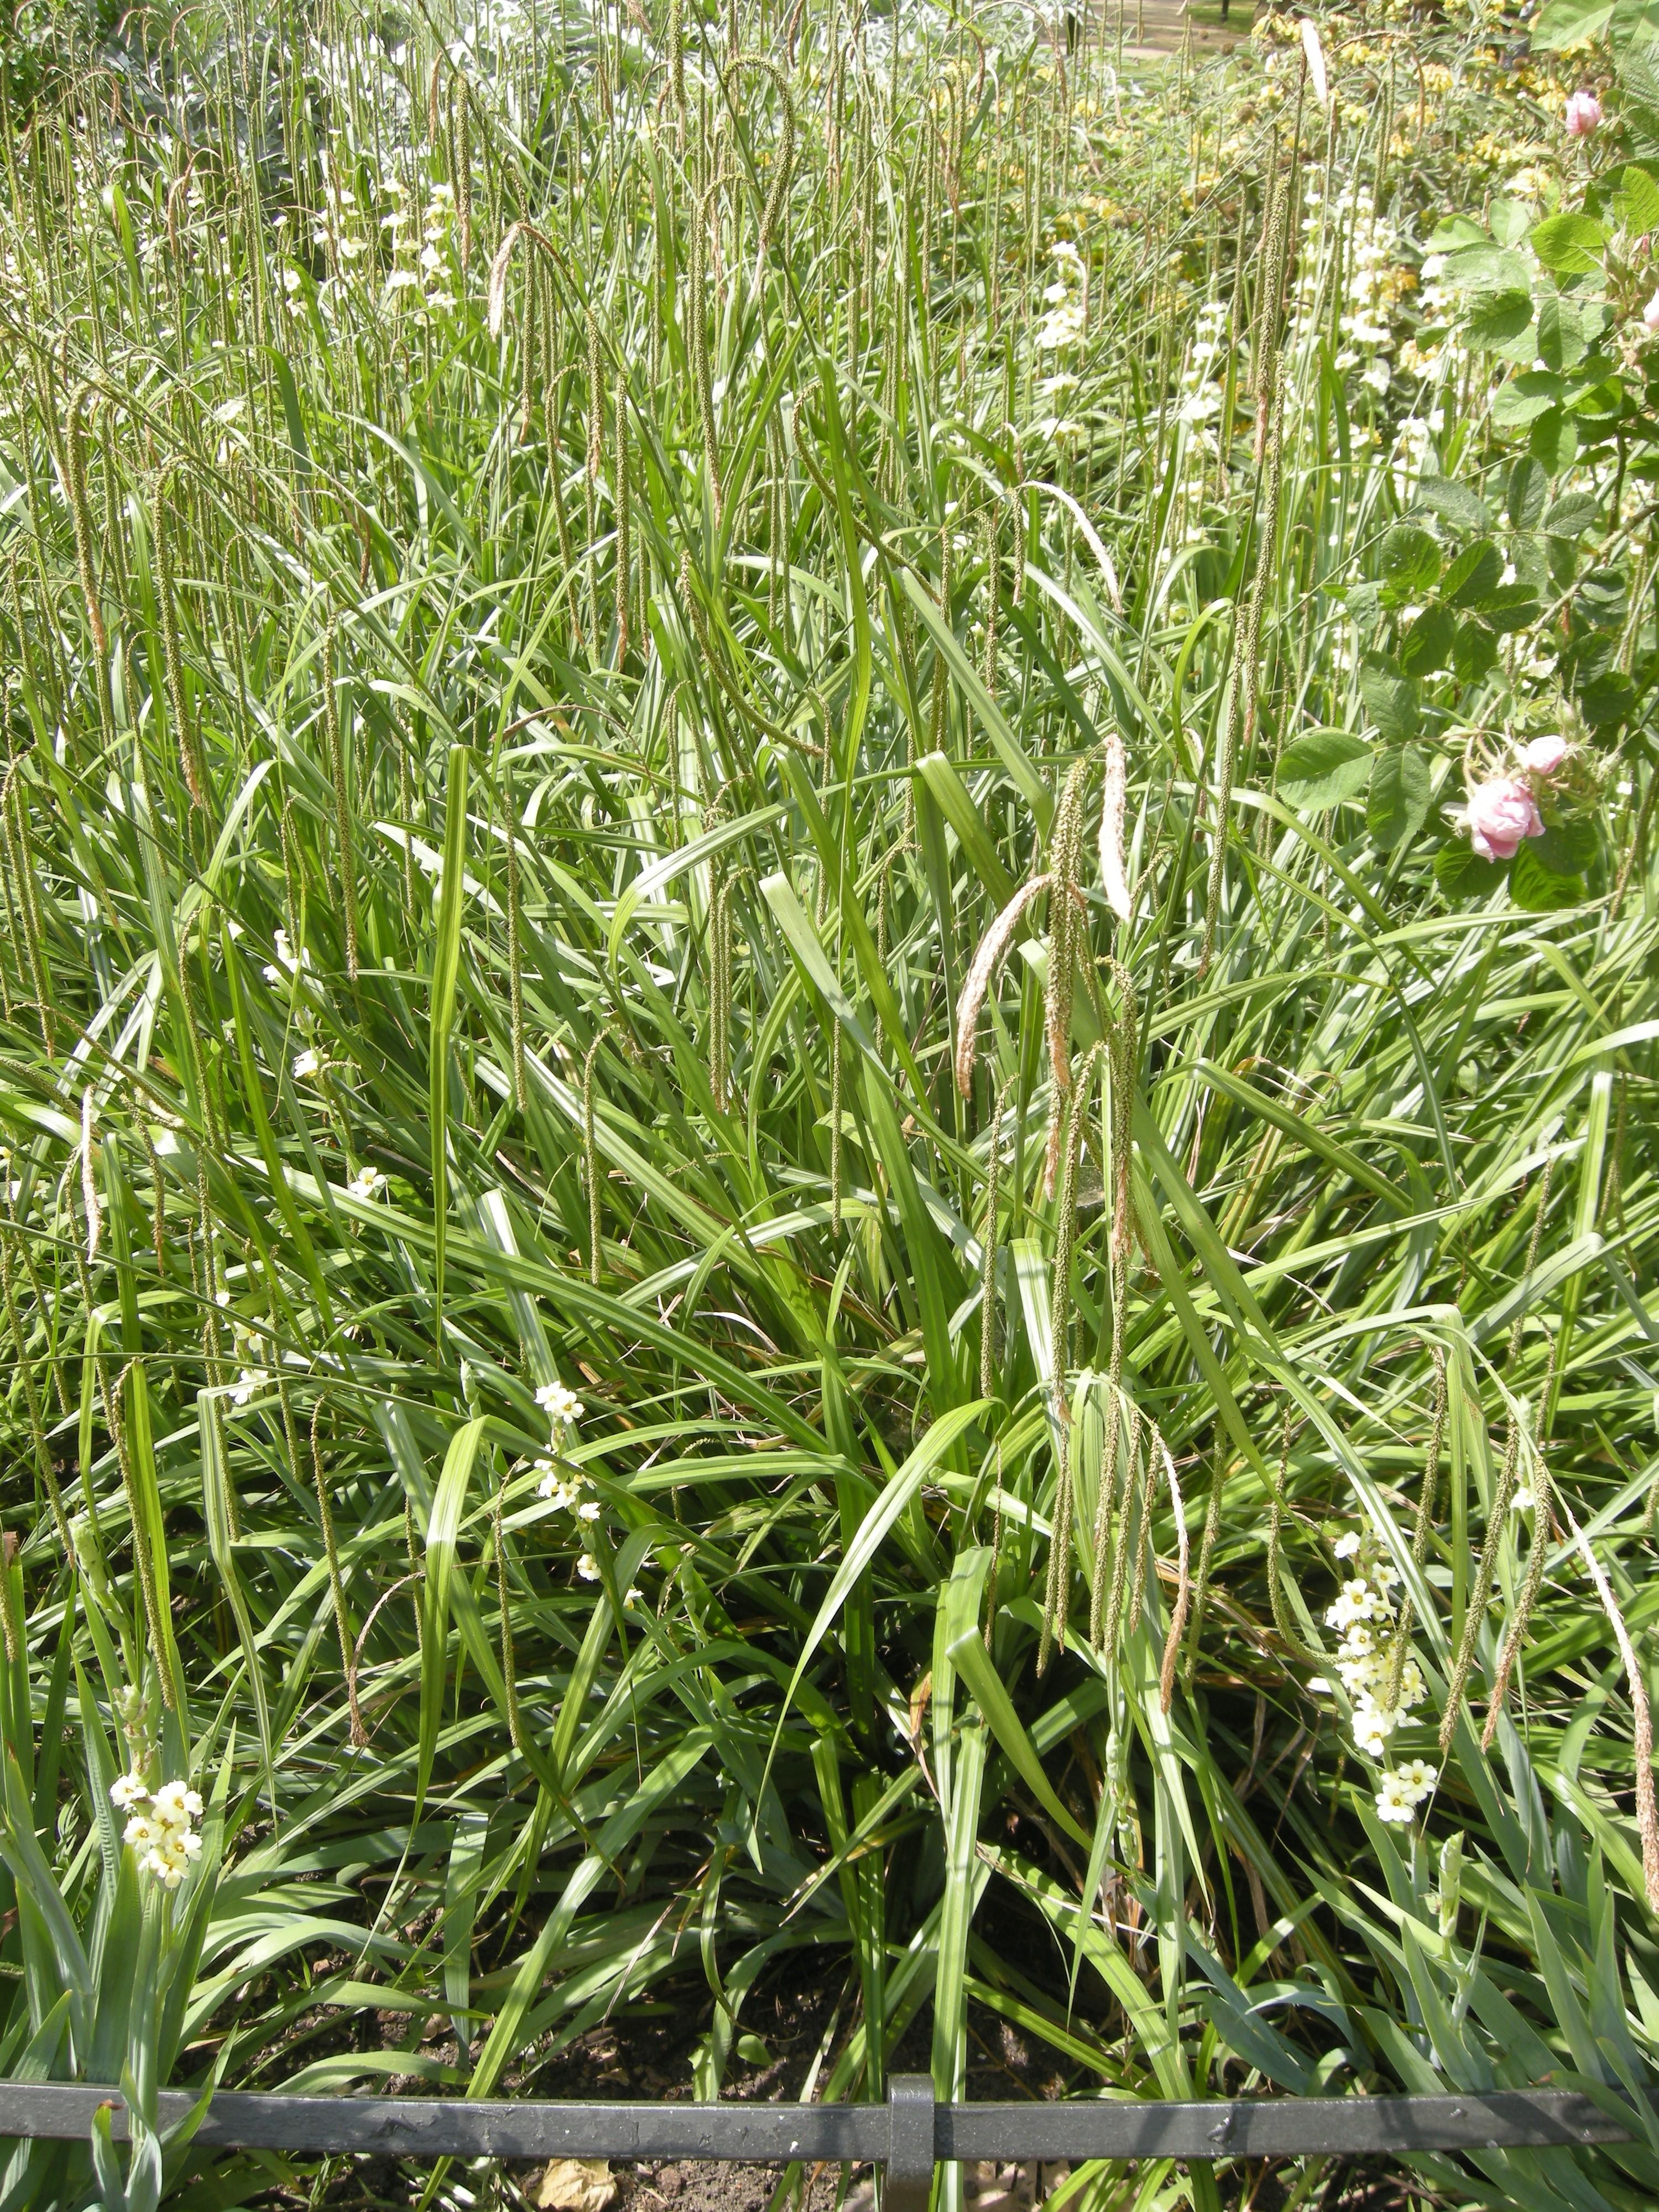 6 Carex Pendula Pendulous Weeping Sedge Ornamental Grasses Pond Grass Plants